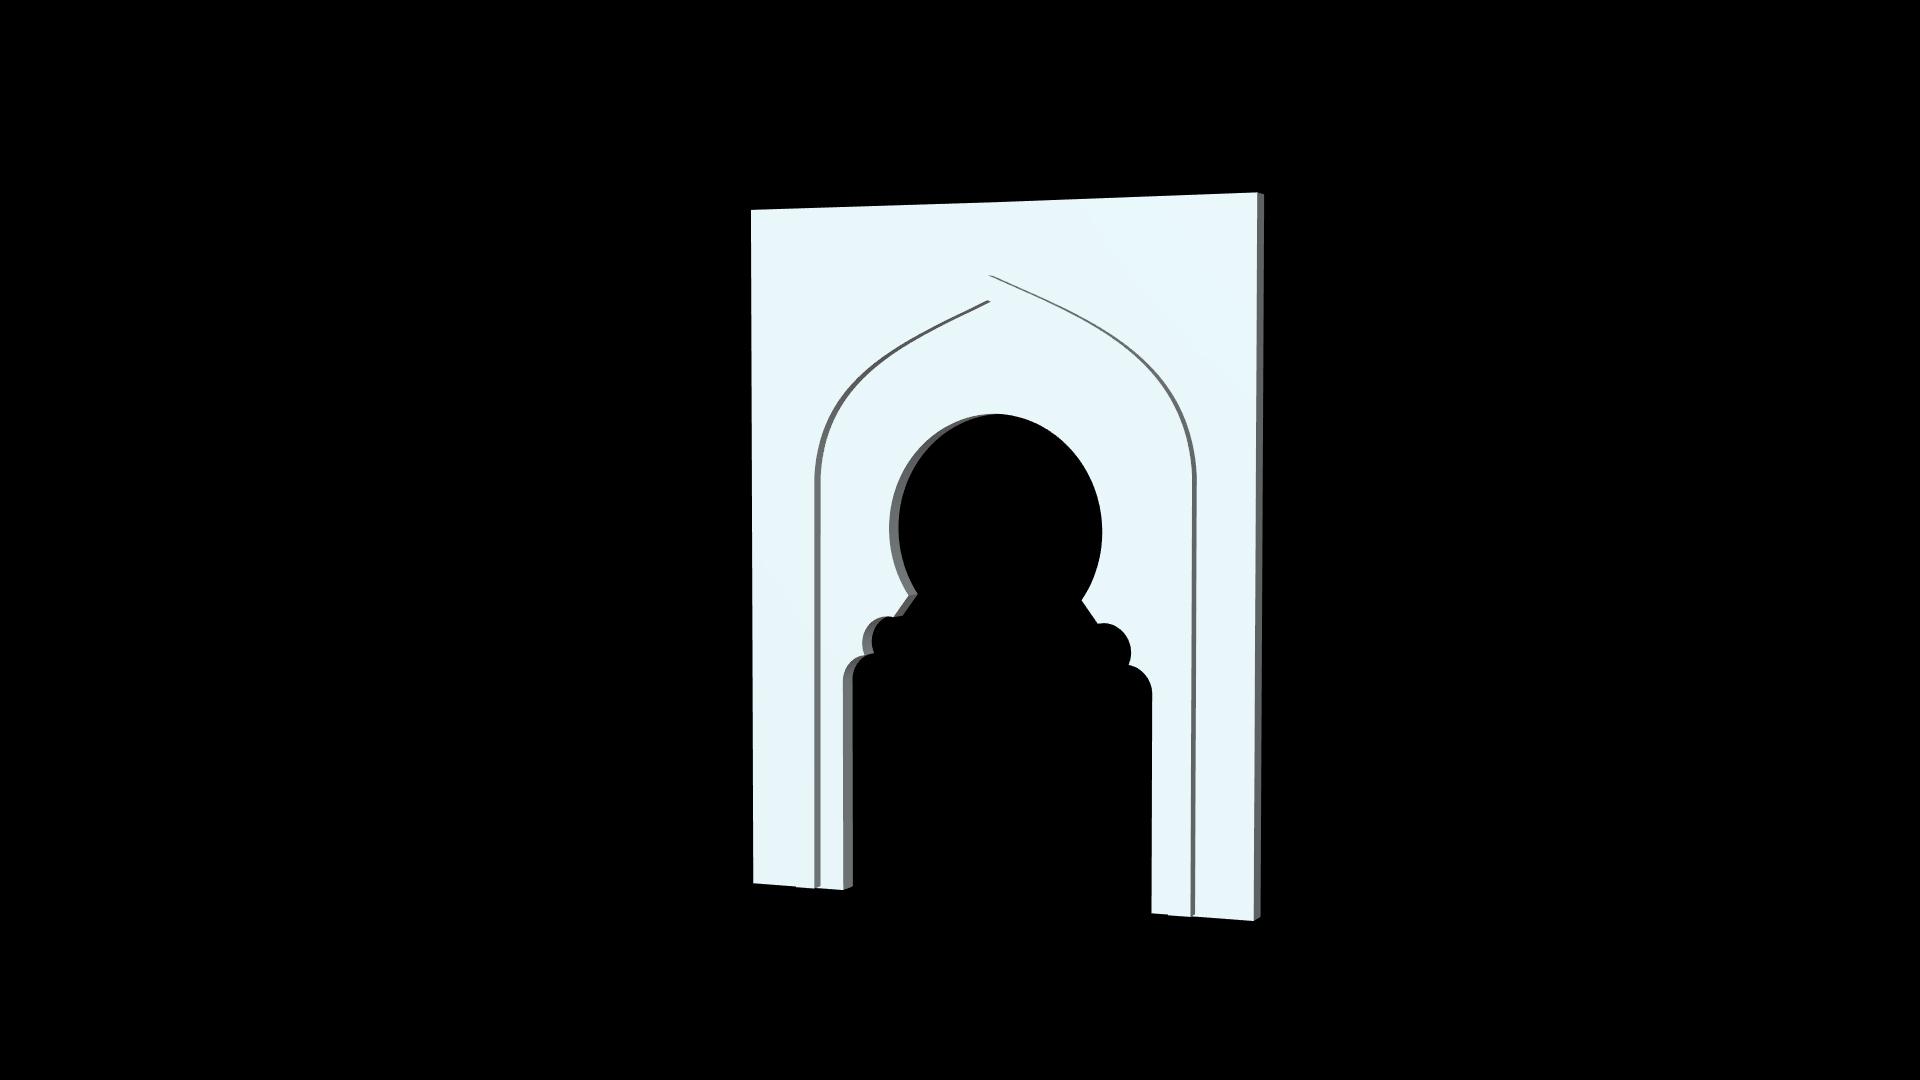 Highly detailed islamic free 3D-model .Obj file - Beautiful Gate frame